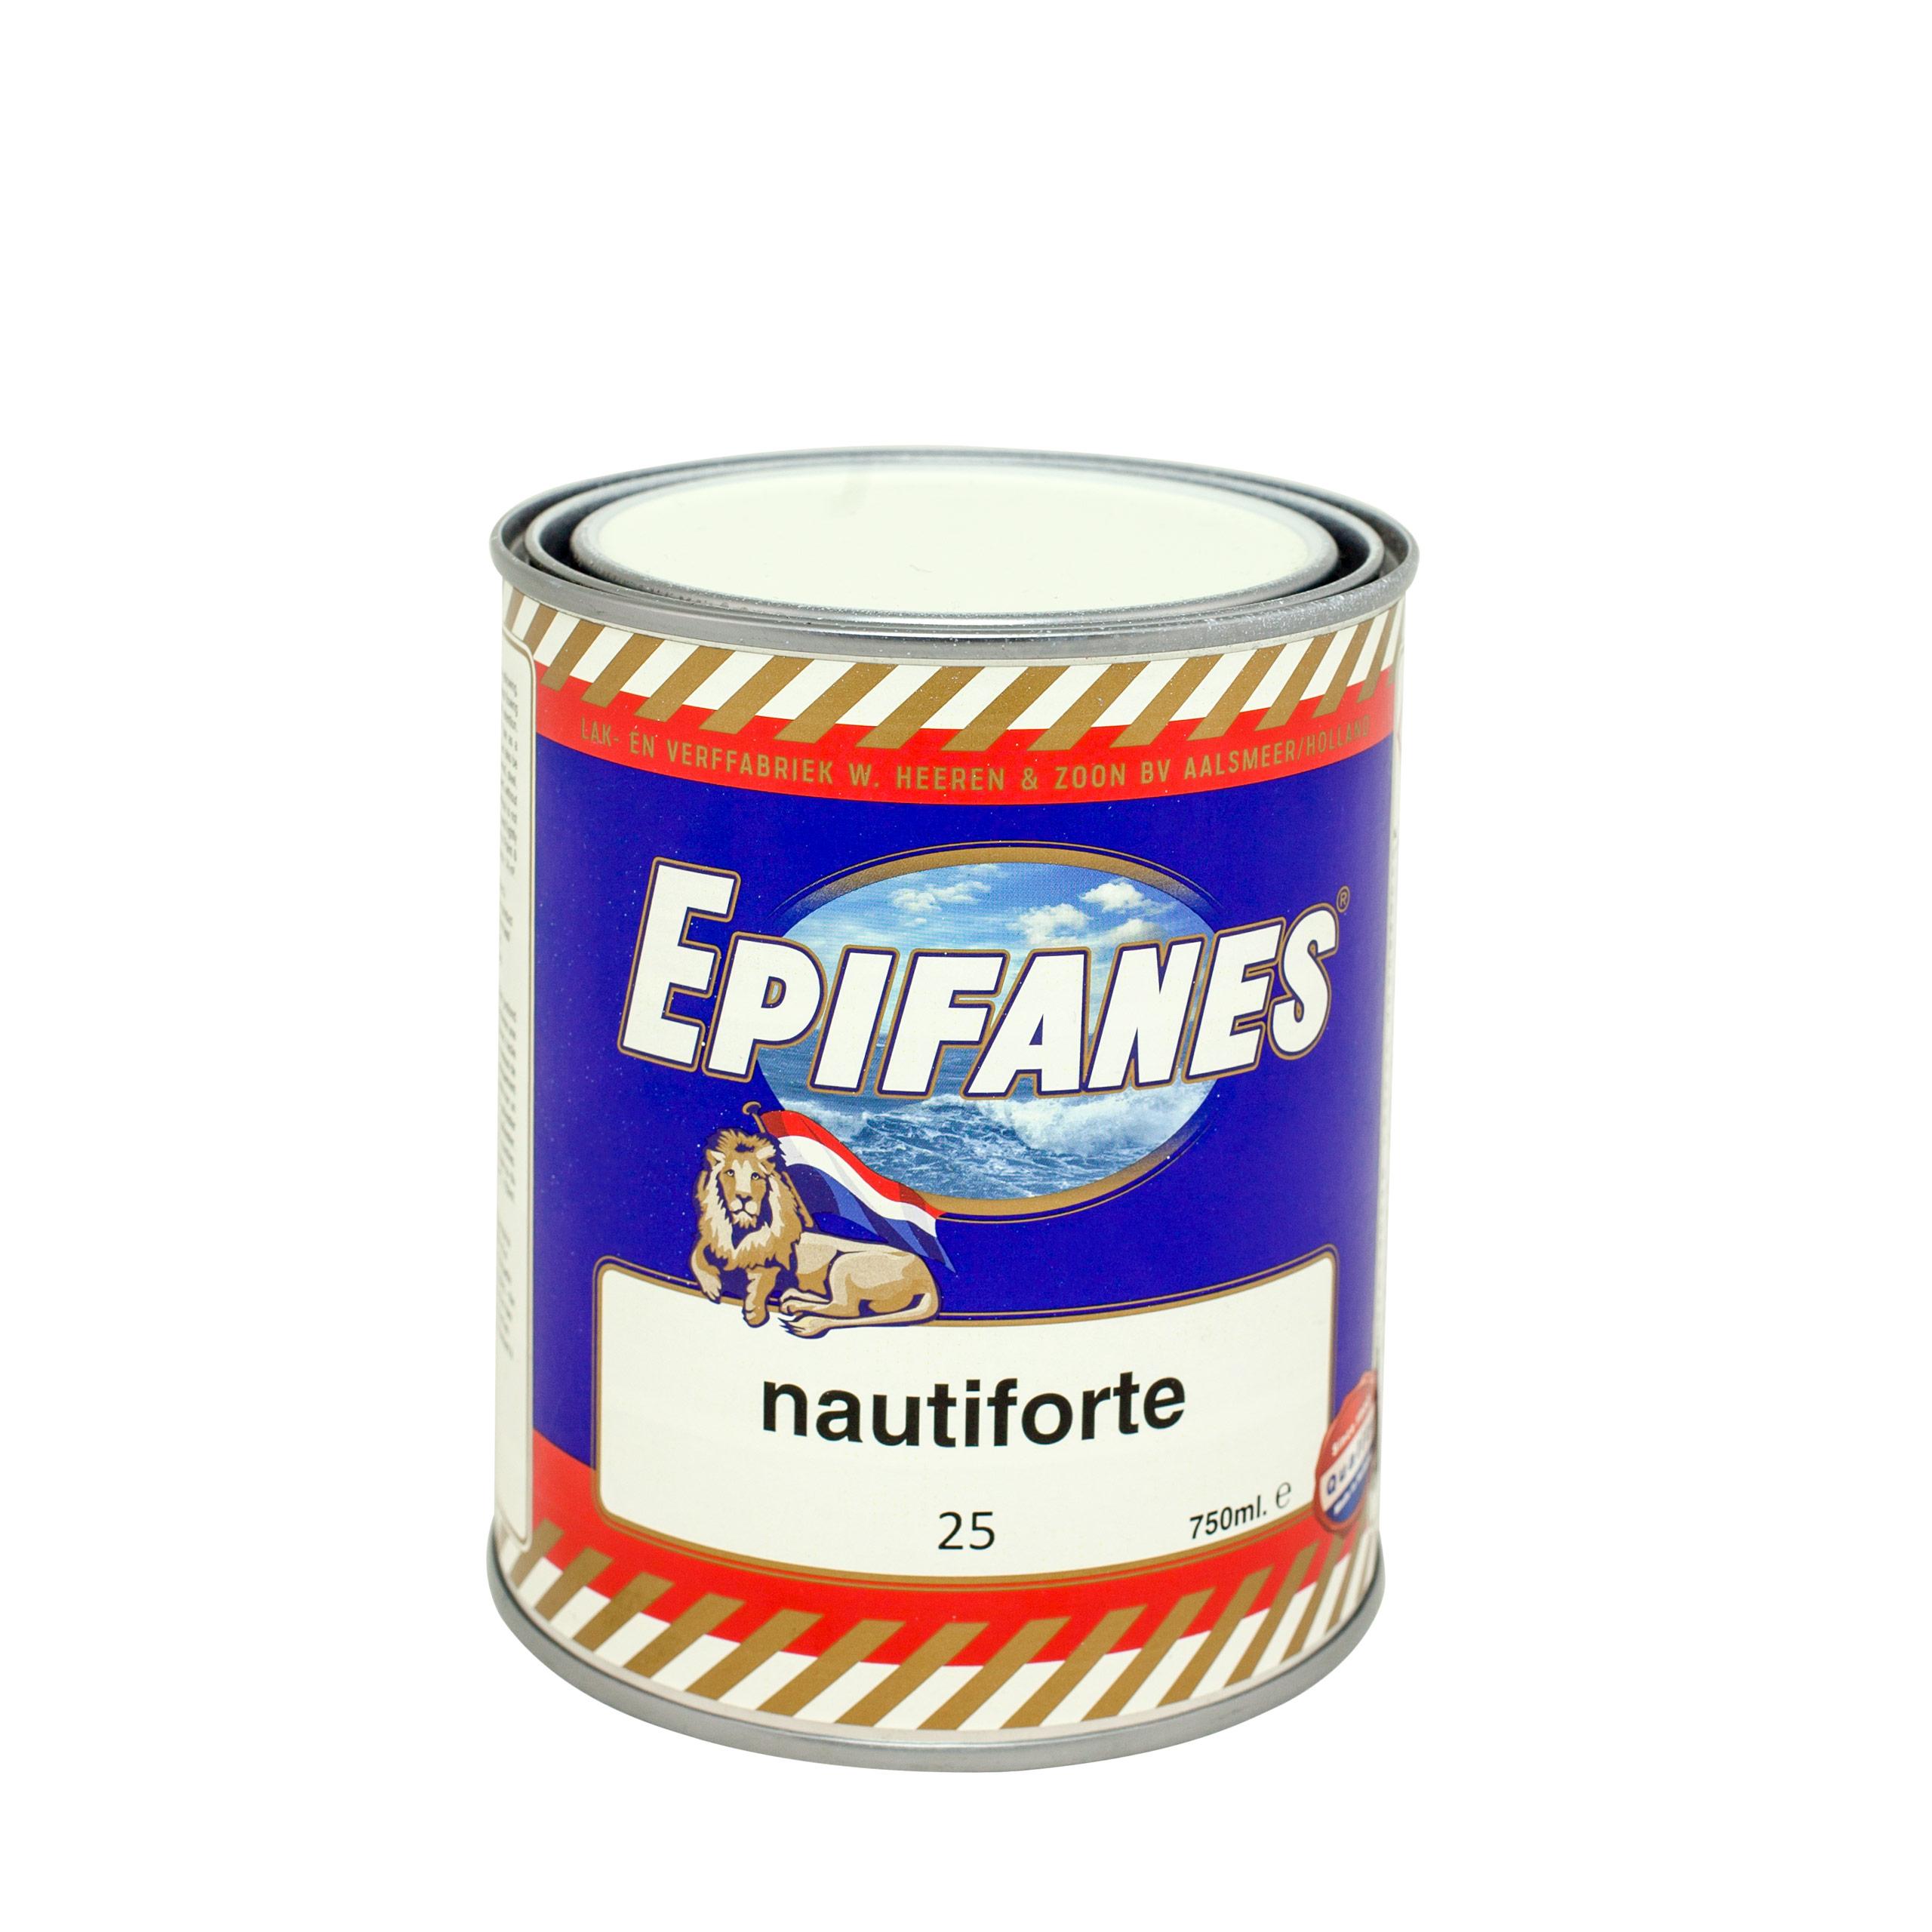 EPIFANES farby s silikón na bokoch lode, biela